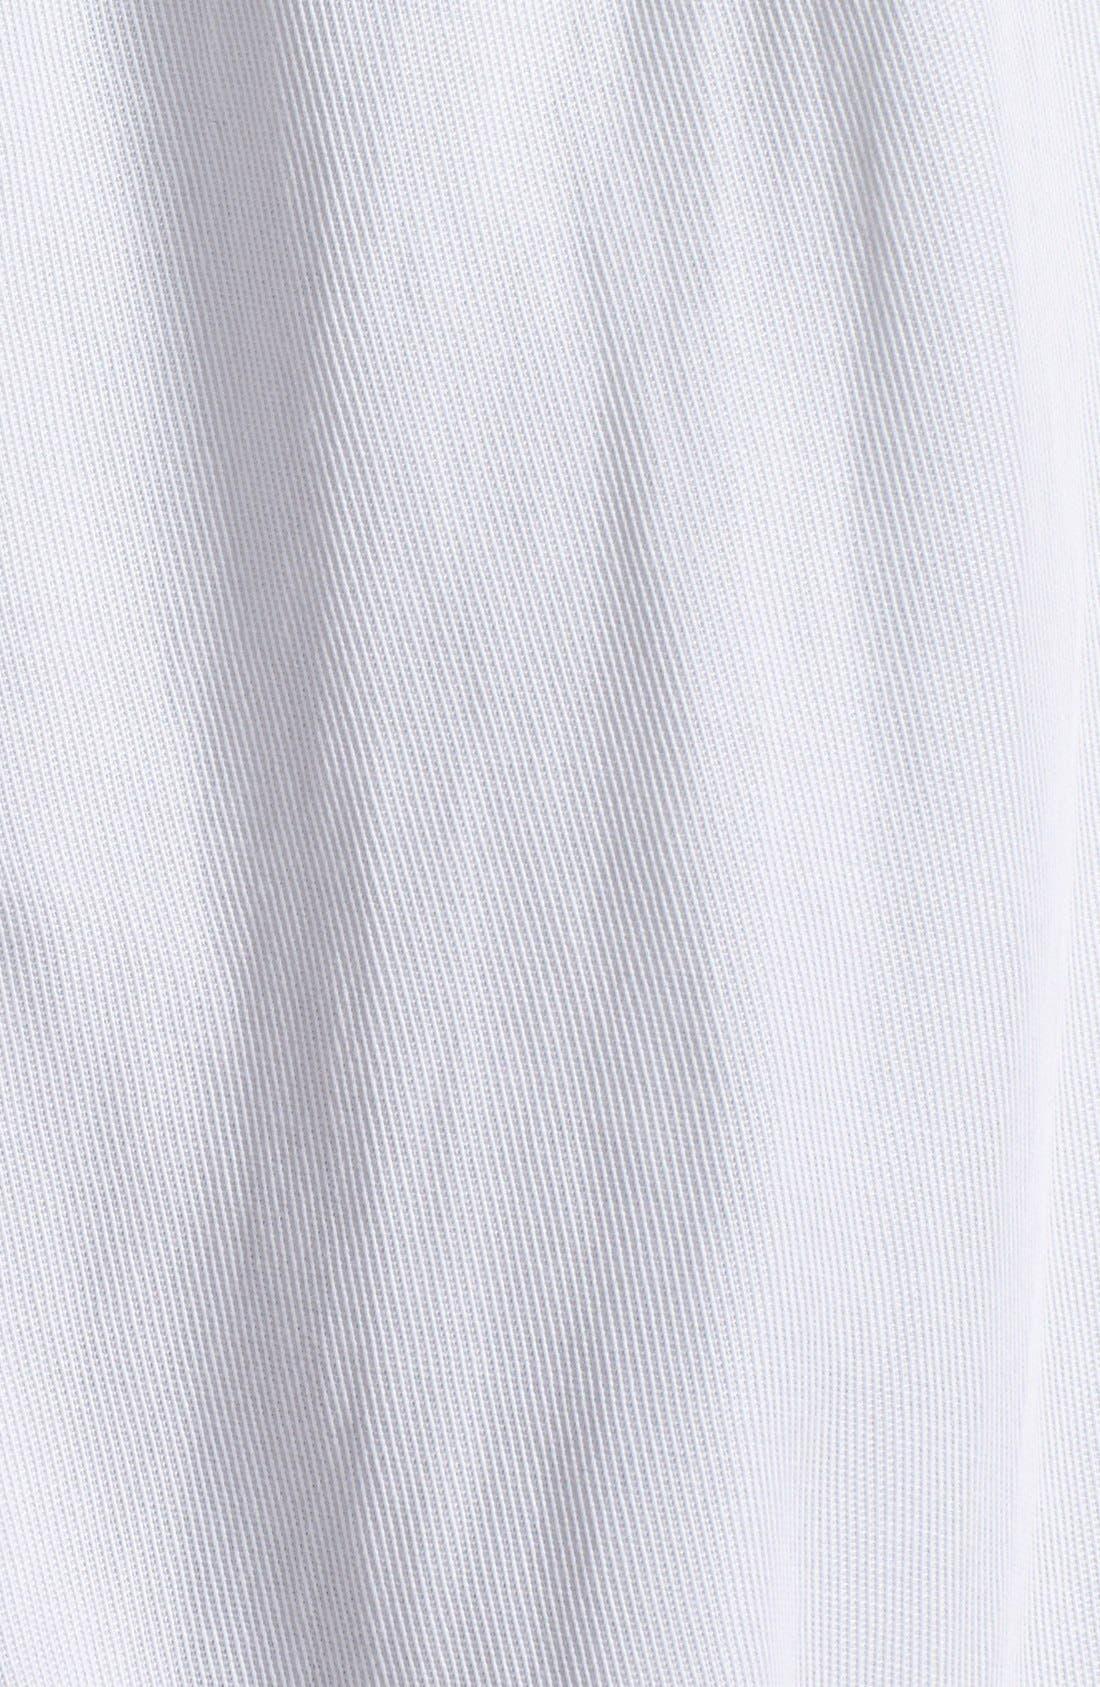 Alternate Image 3  - Vince 'Luxe' Short Anorak